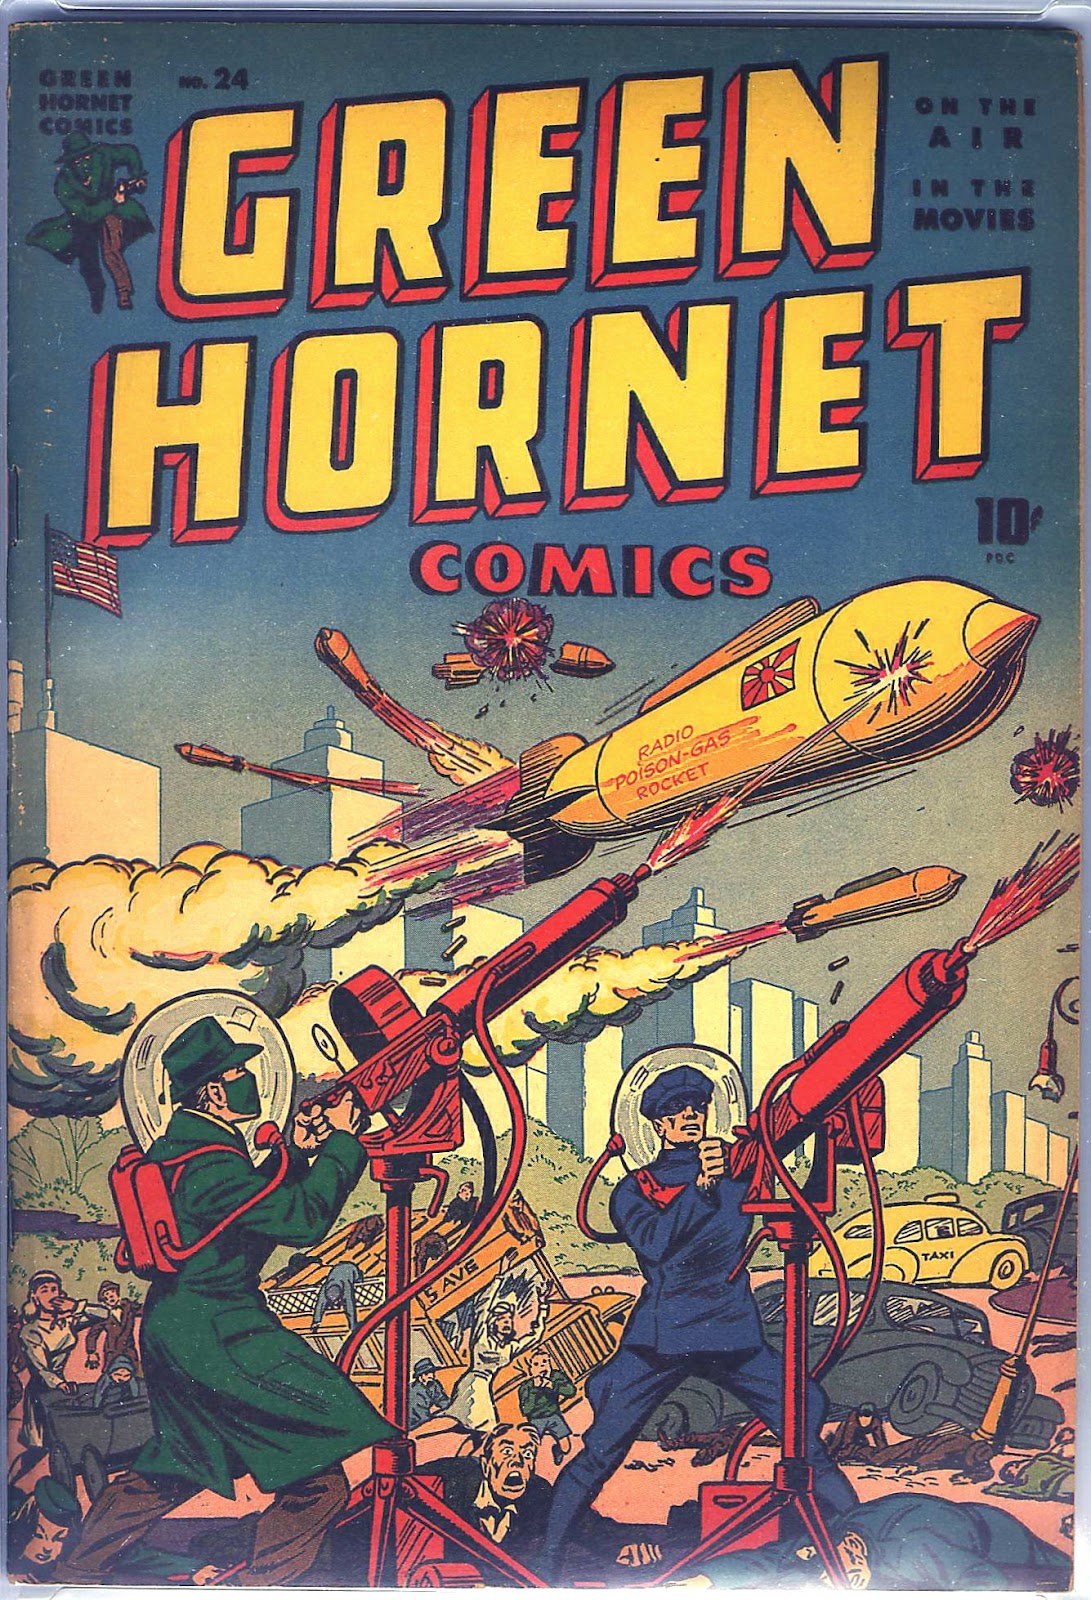 Green Hornet Comics 24 Page 1